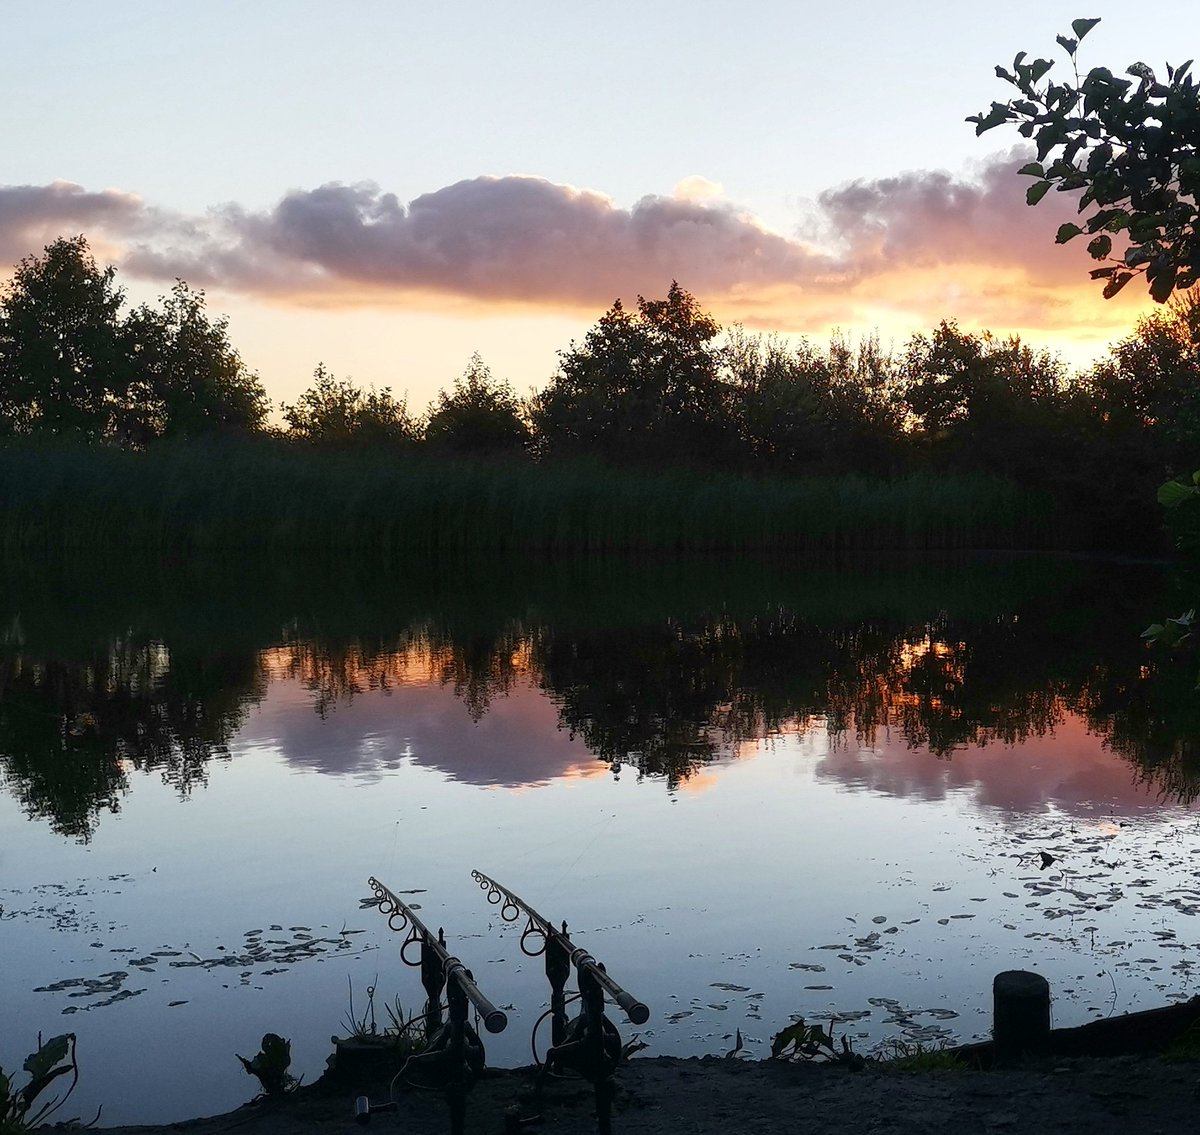 Carp fishing last summer, sunrise on a lake can be magical 😍  #carpfishing #sunrise #fishing #lak